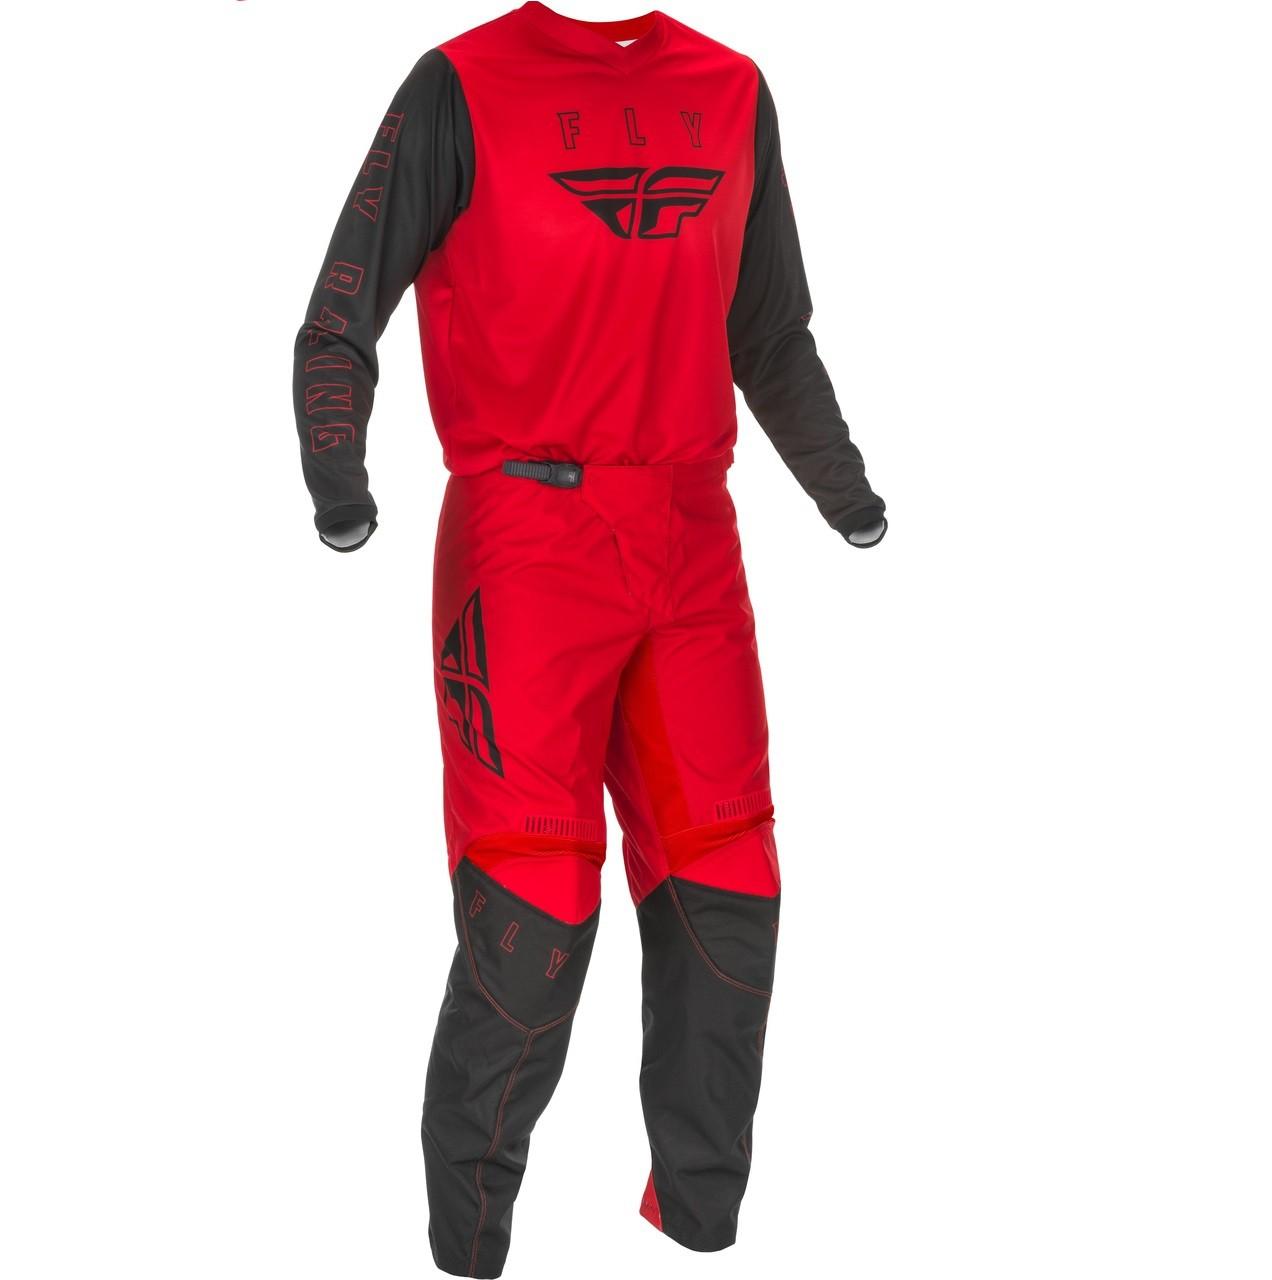 Kit Calça + Camisa Motocross Fly F-16 2021